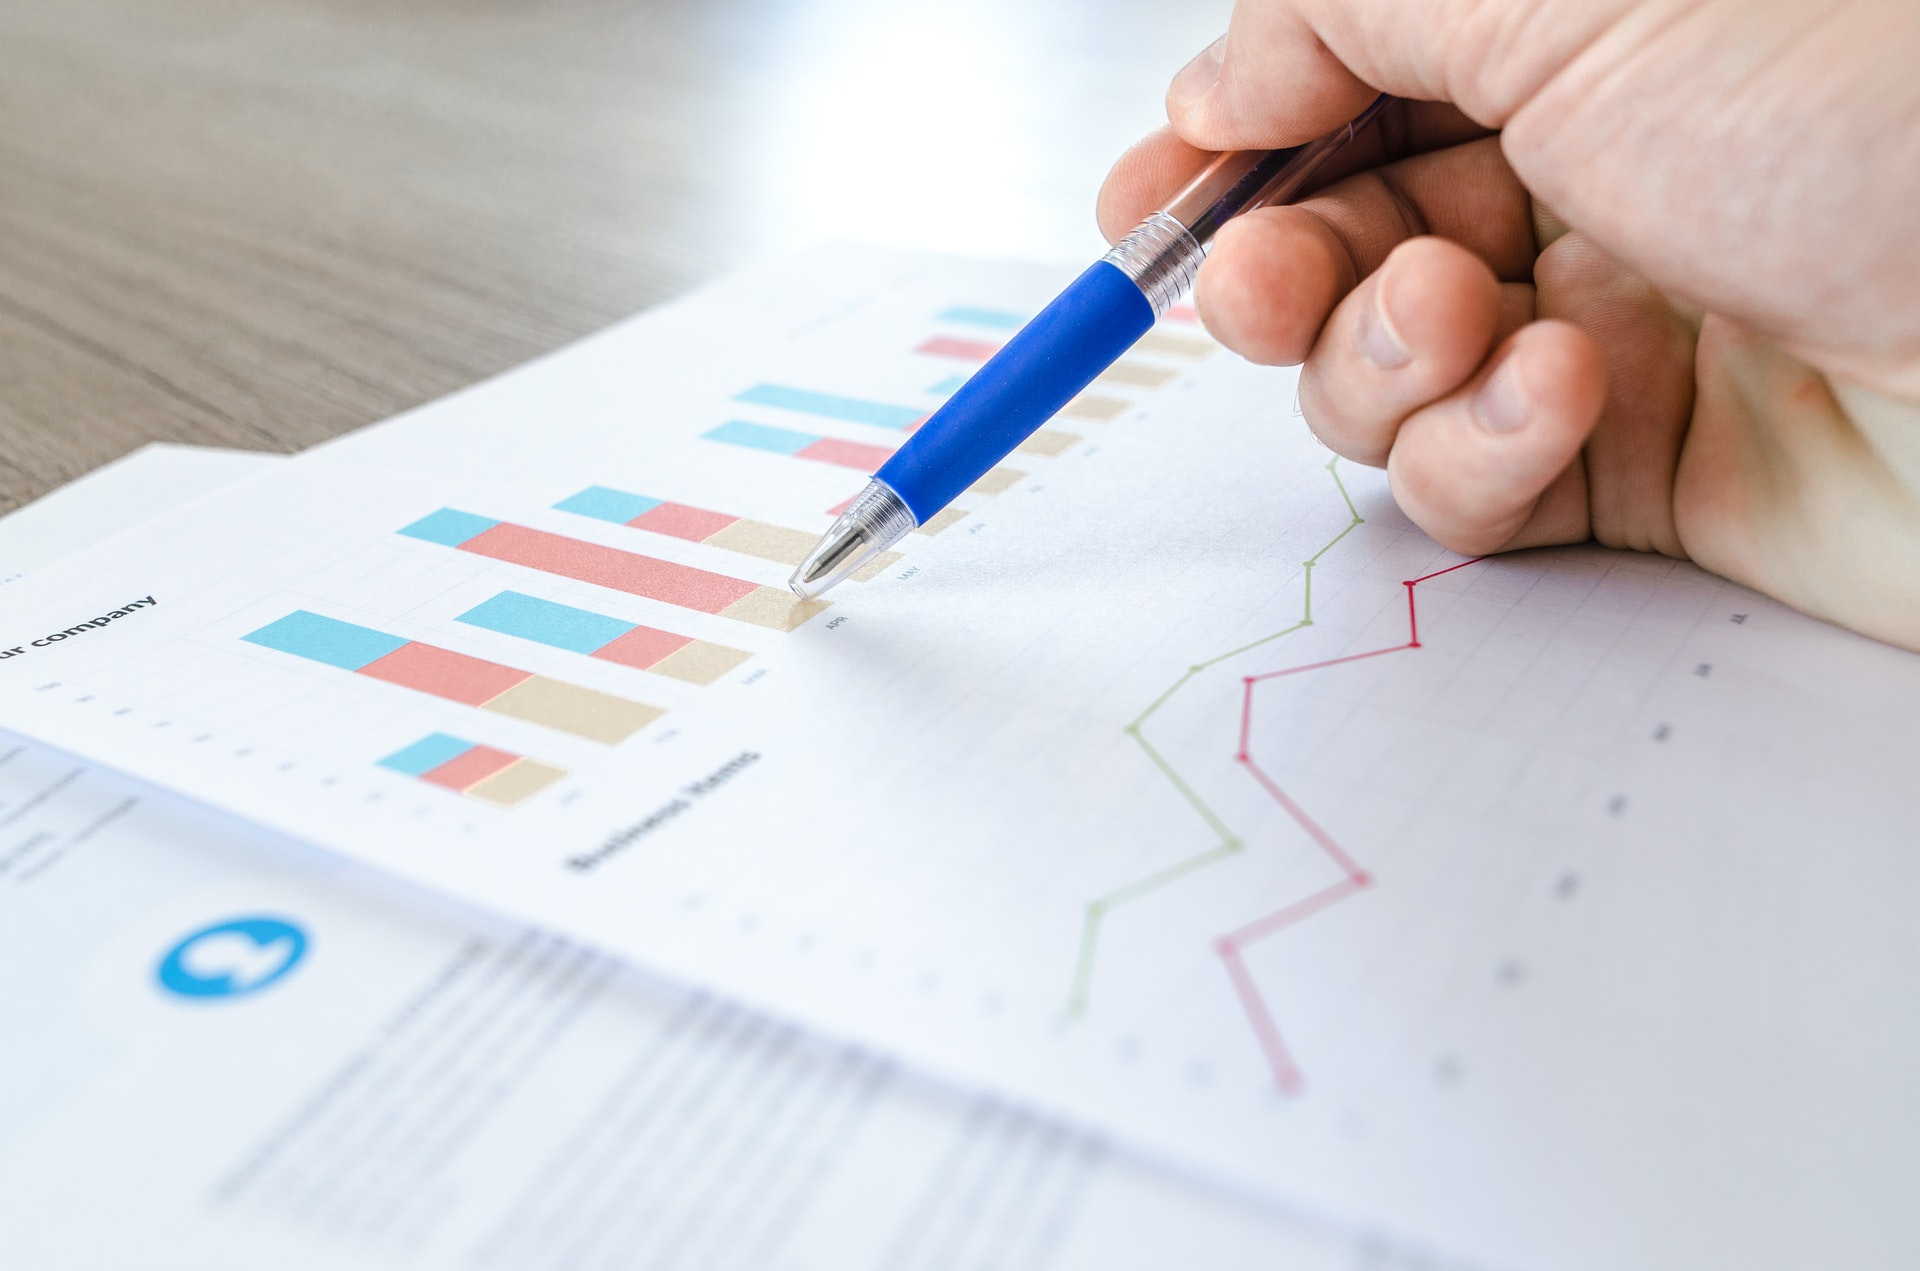 Social Sentiment Helps Predict Stock Market Trend (2020) - Stockgeist